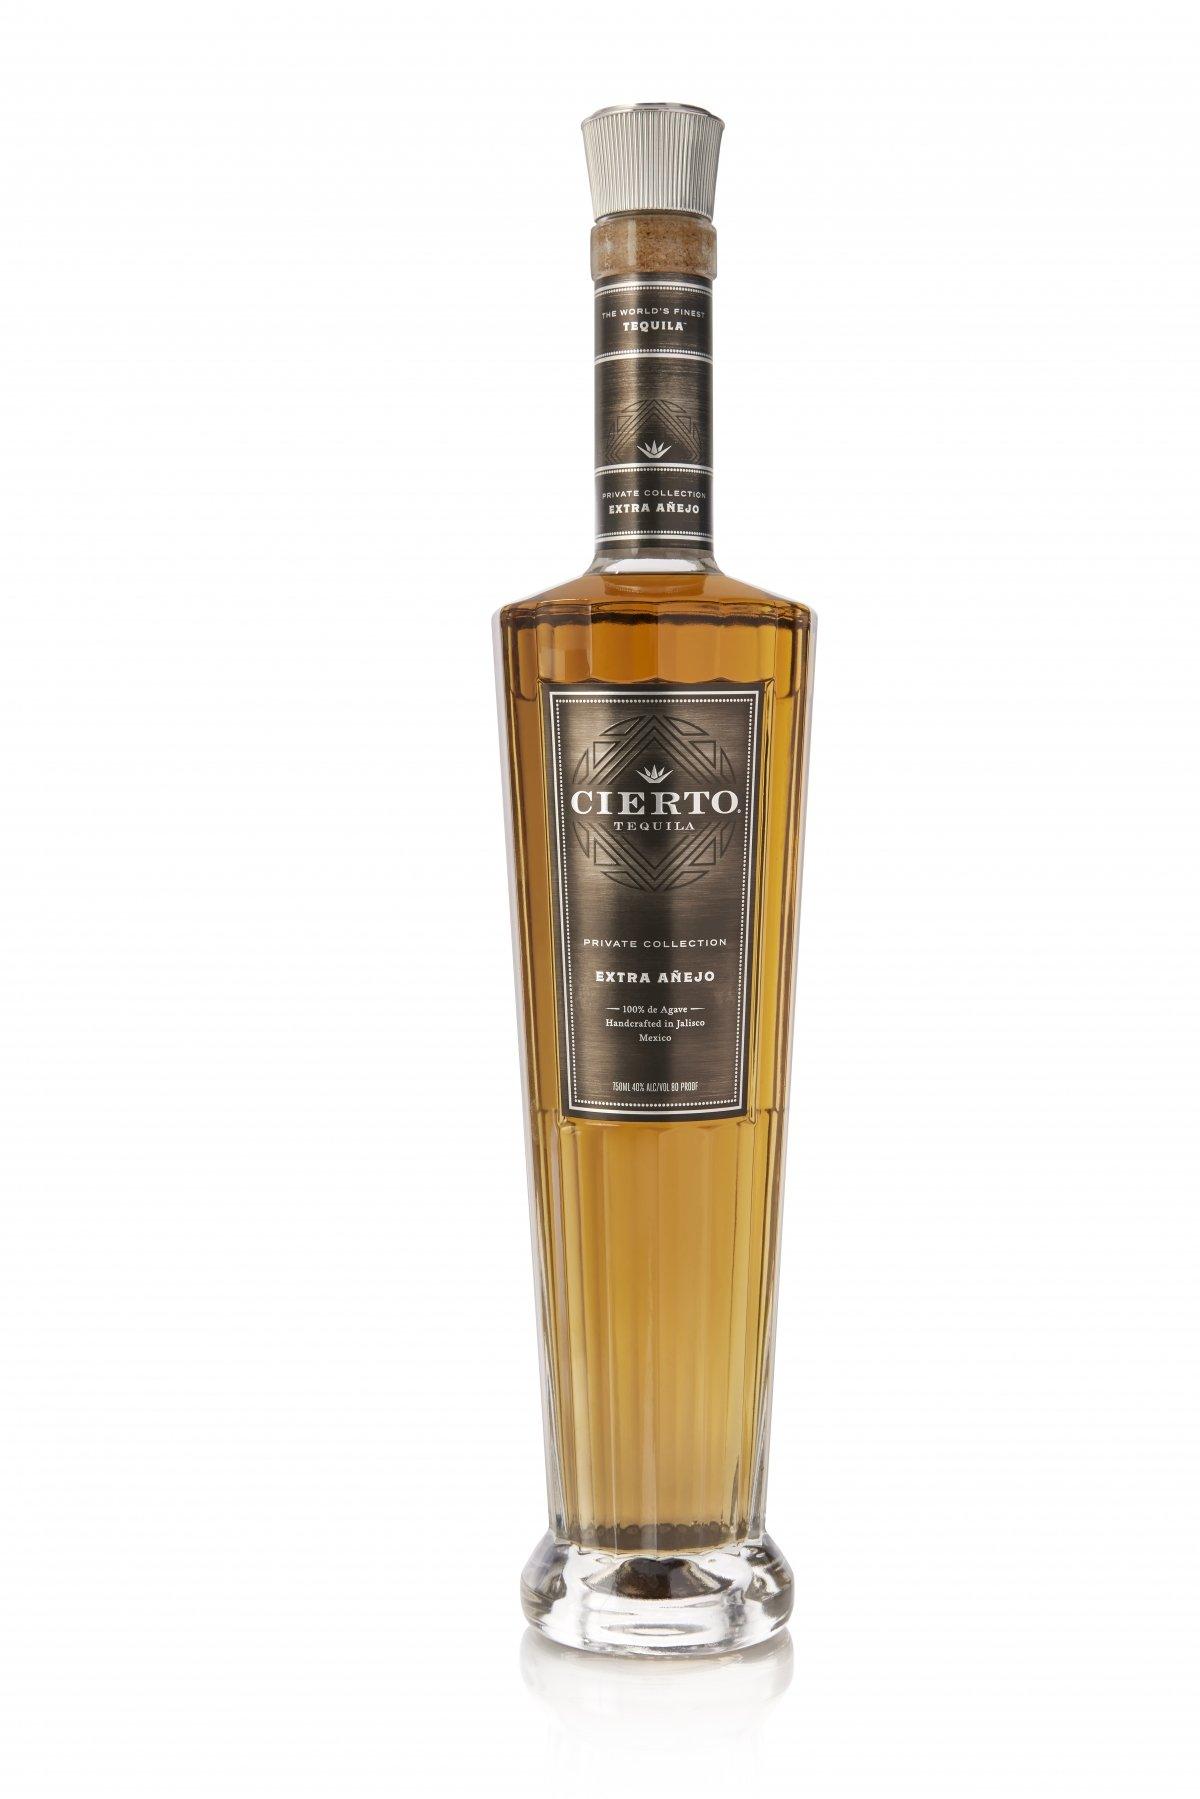 Botella de Cierto Tequila Private Collection Extra Añejo